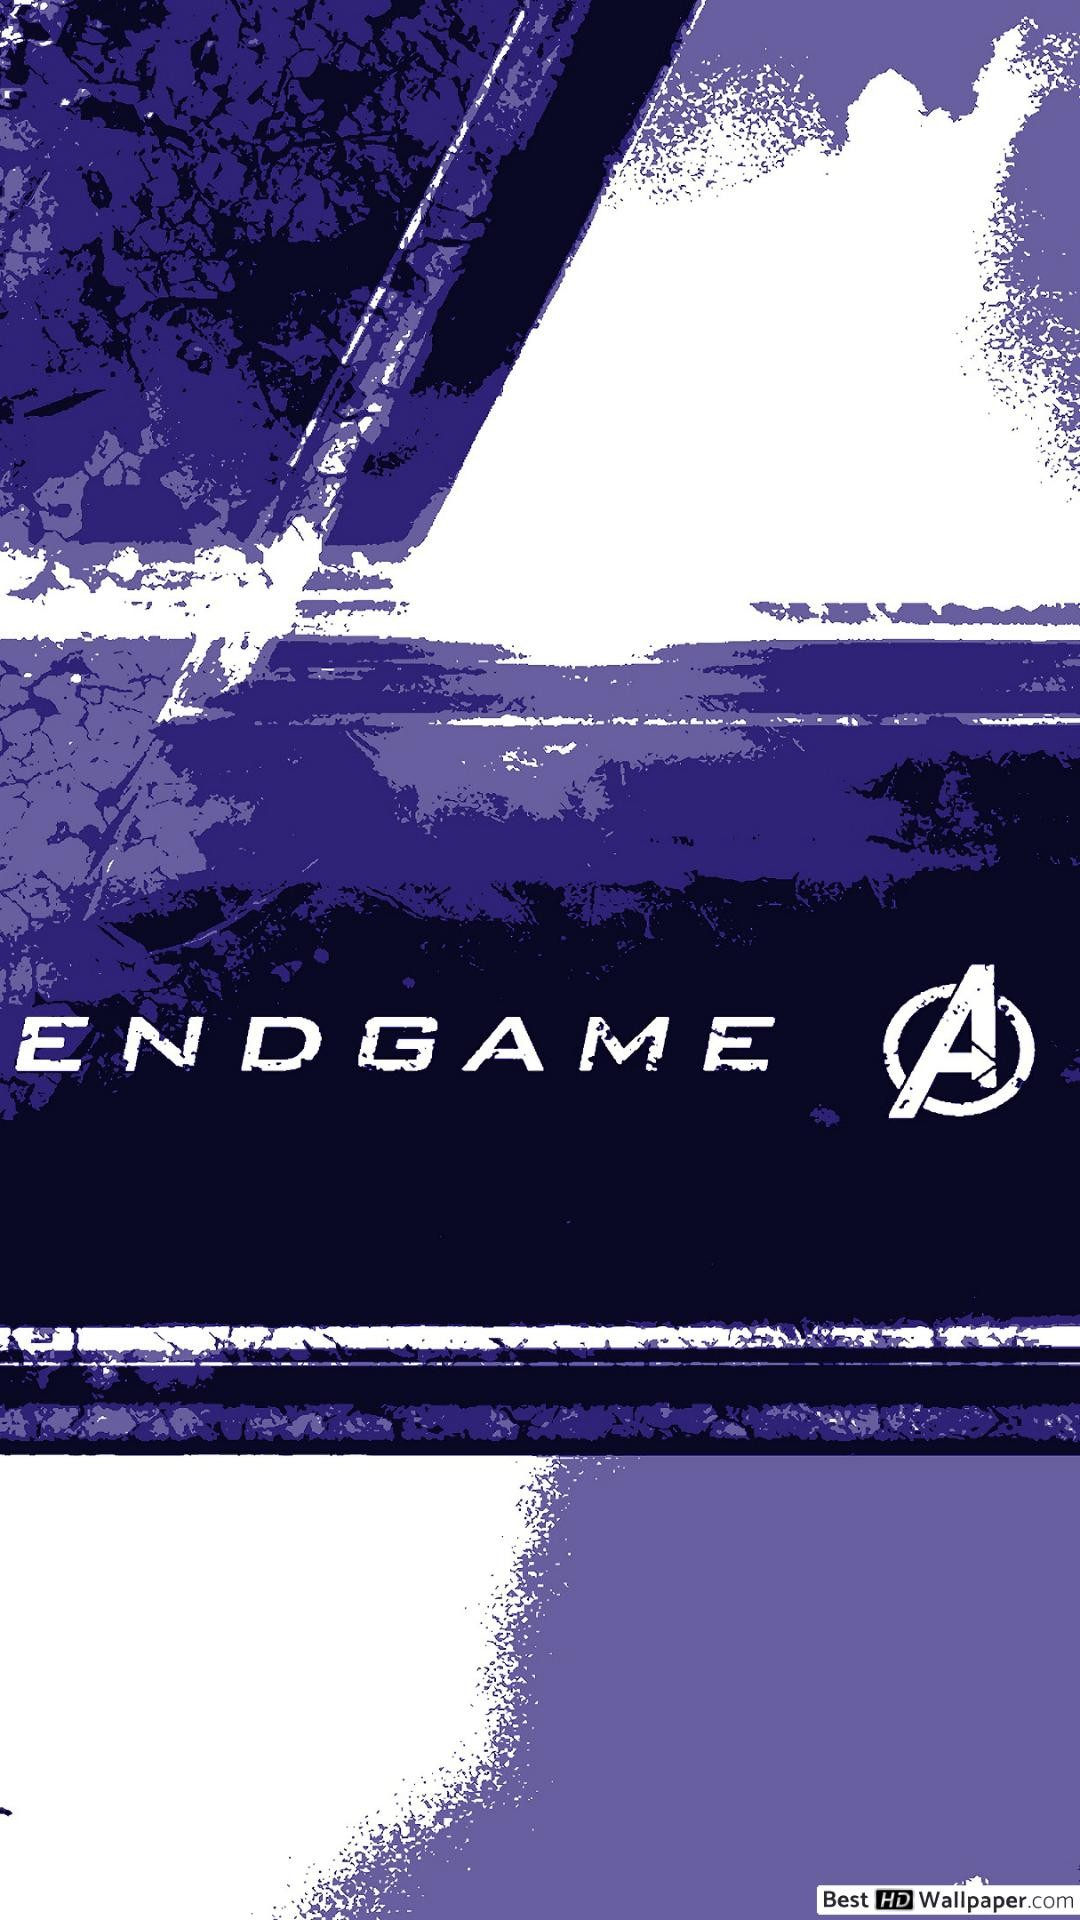 Res: 1080x1920, Avengers Endgame Logo Hd Wallpaper Download